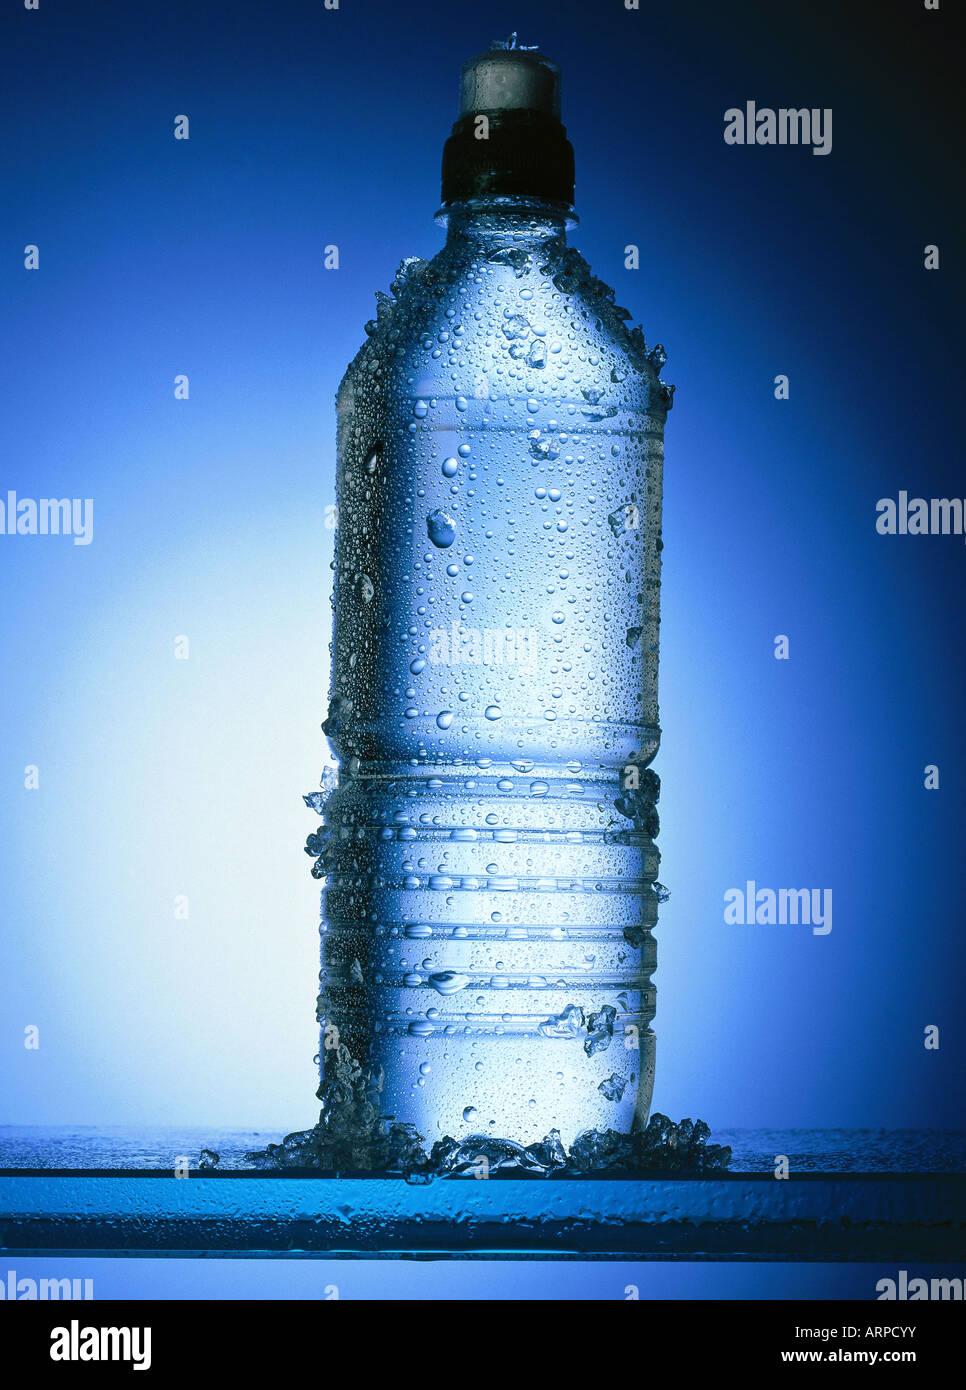 Botella de agua Imagen De Stock